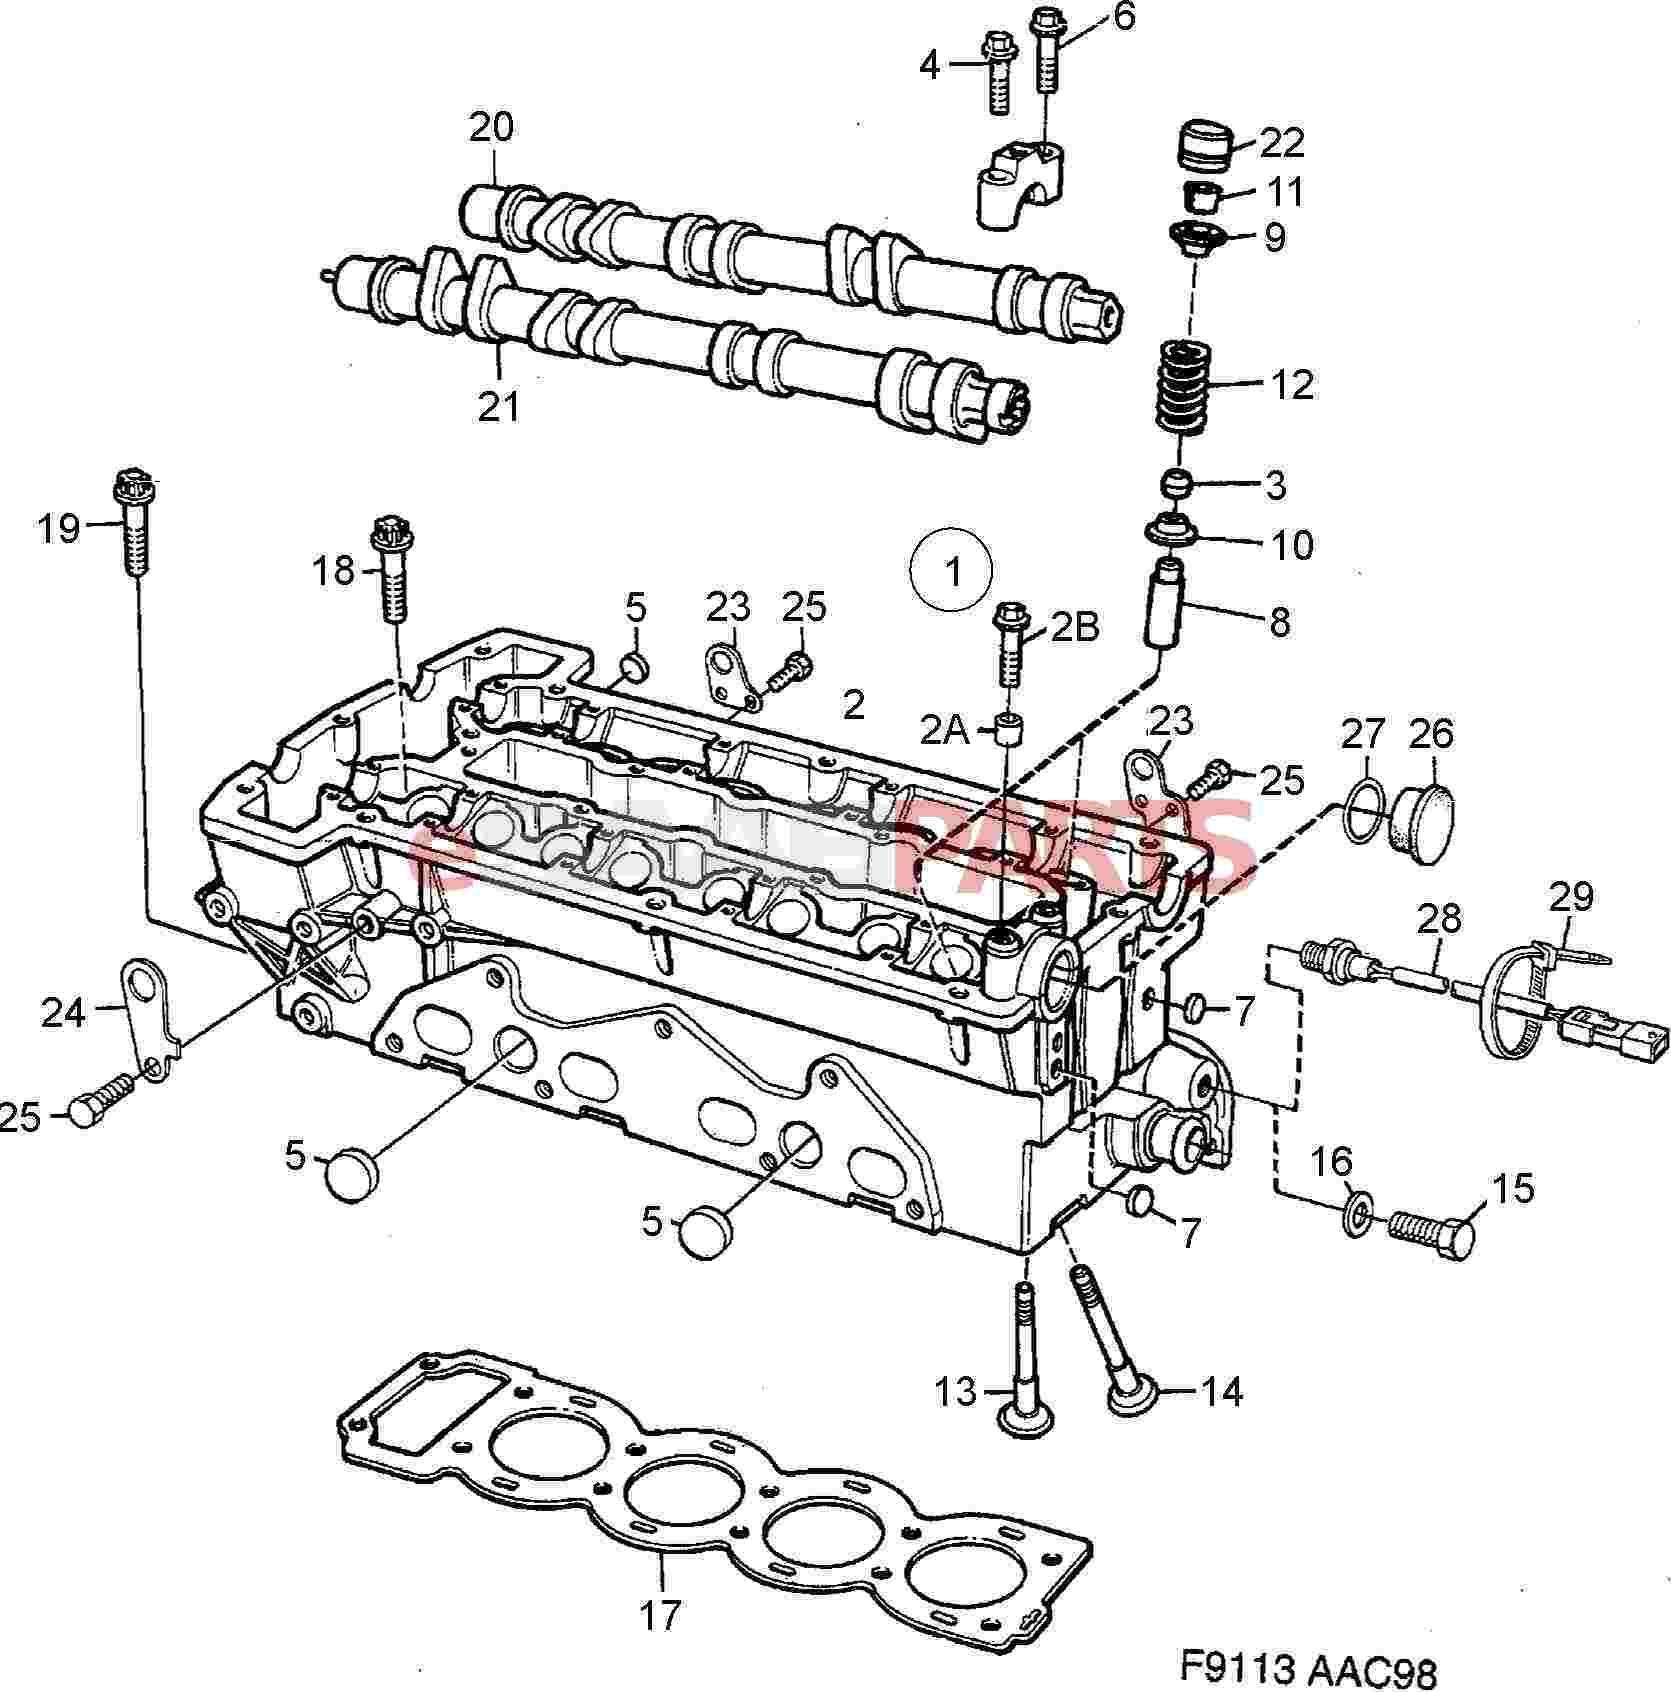 Chrysler Pt Cruiser Purge Valve Solenoid Installation